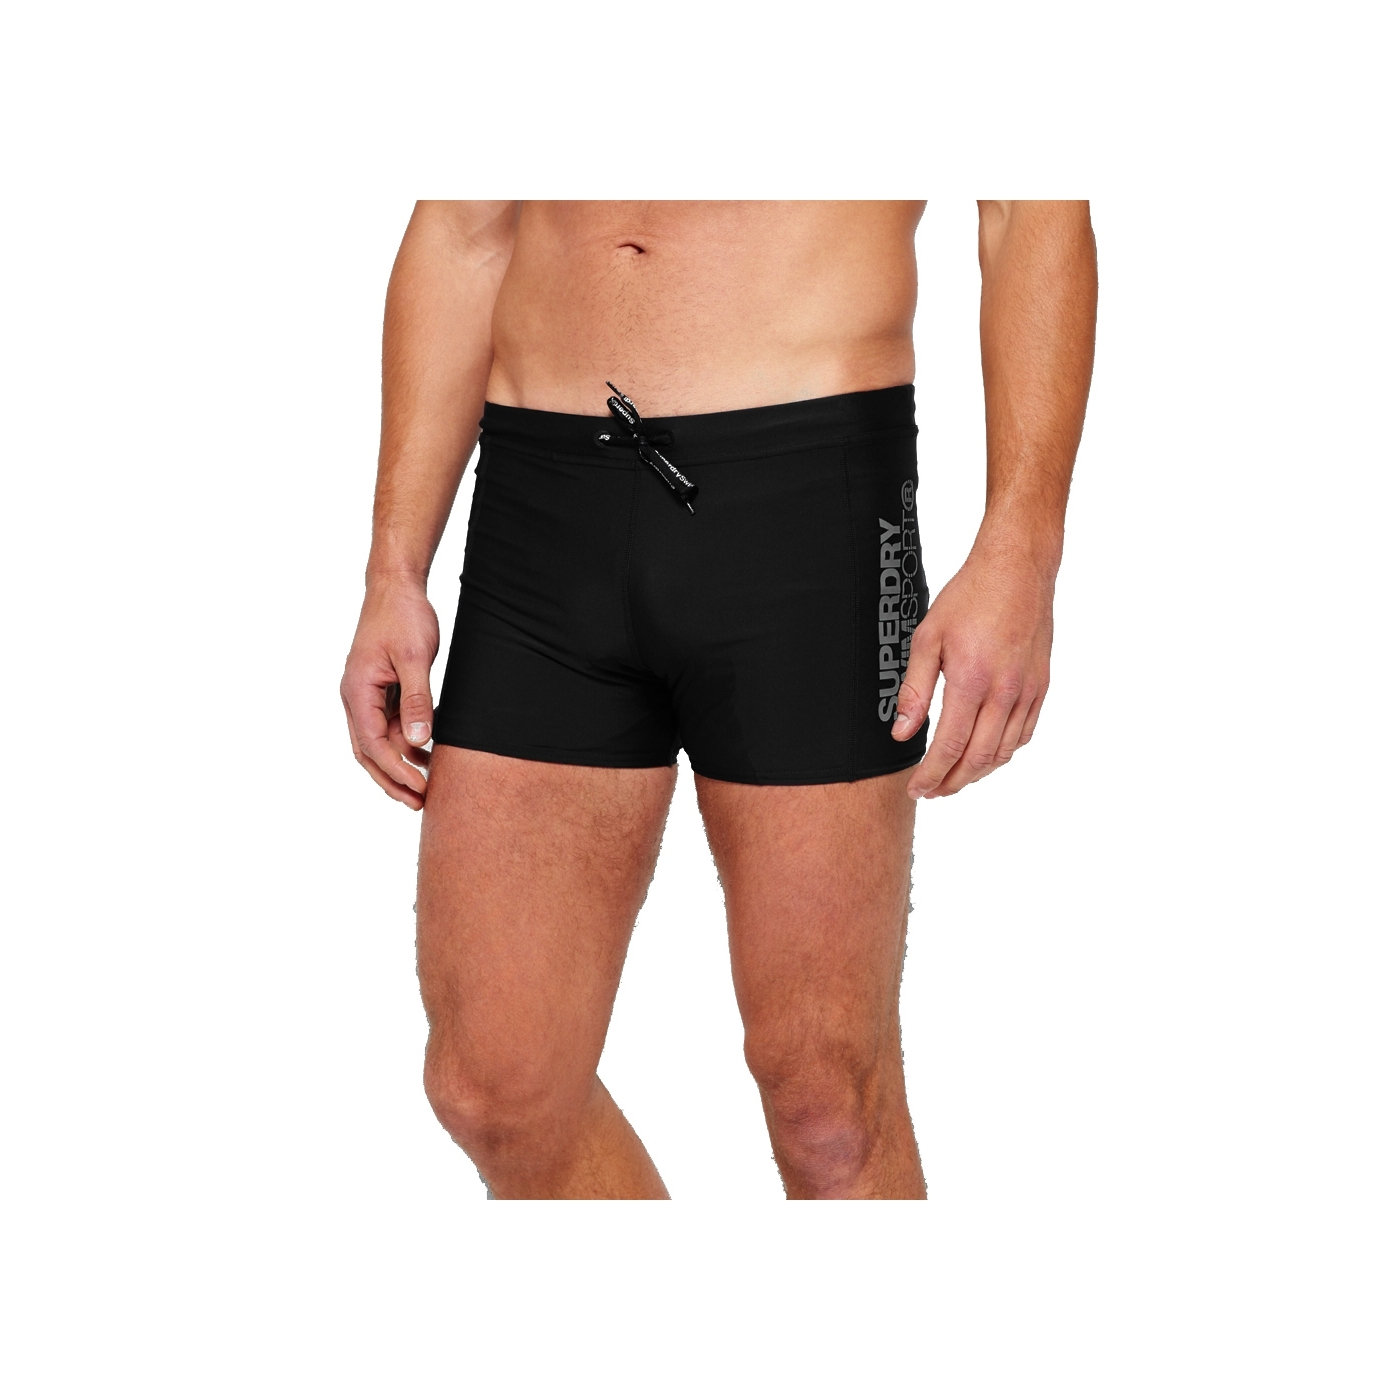 Superdry Sport Maillot Swim Pour Homme Bain Trunk Black Shorts De Midi Ygmf7I6yvb